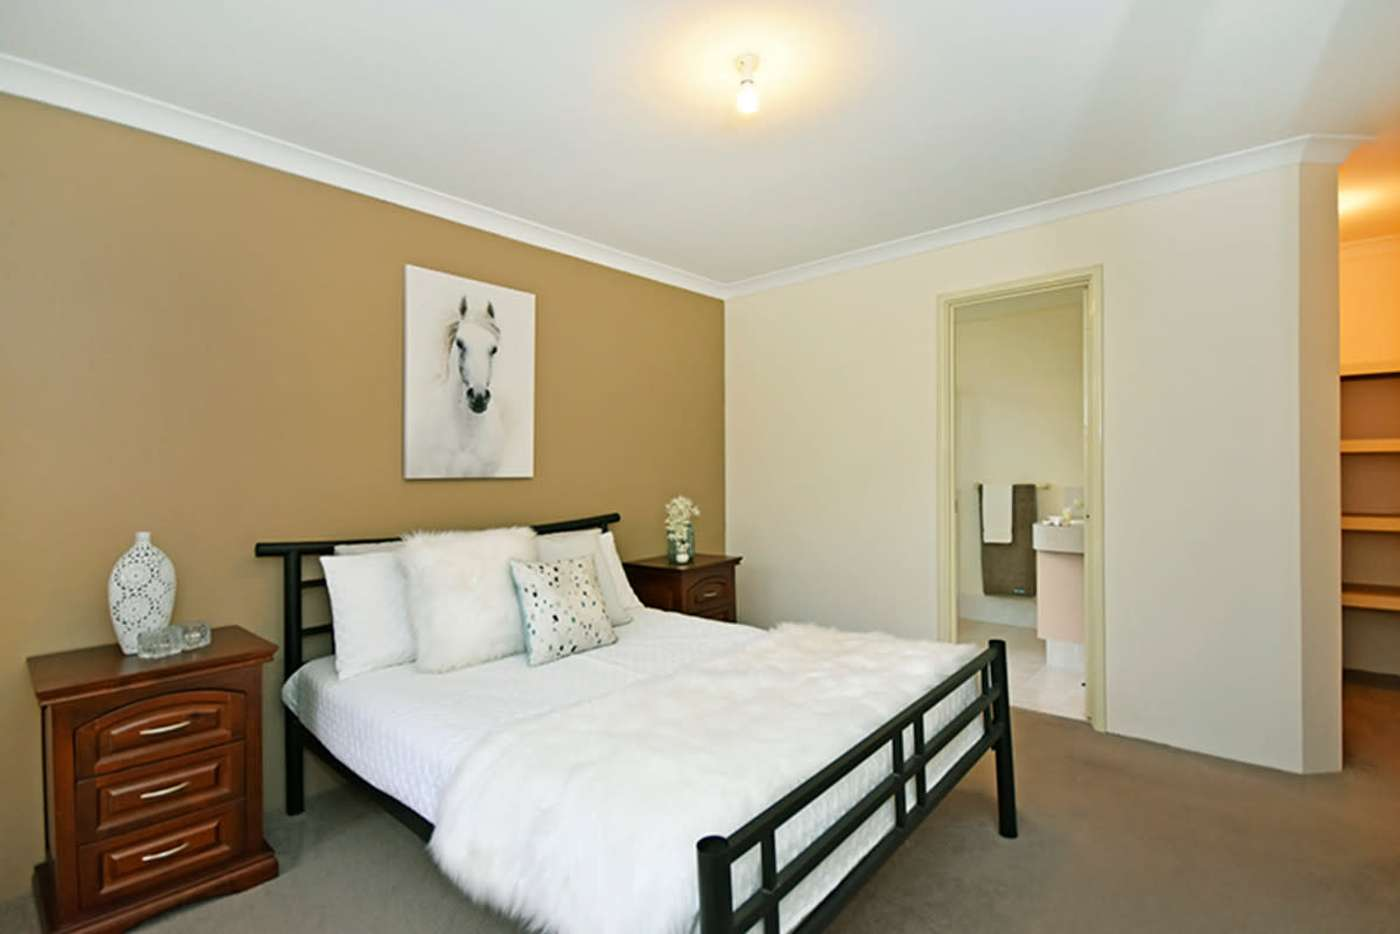 Sixth view of Homely house listing, 12 Tuscany Place, Caversham WA 6055